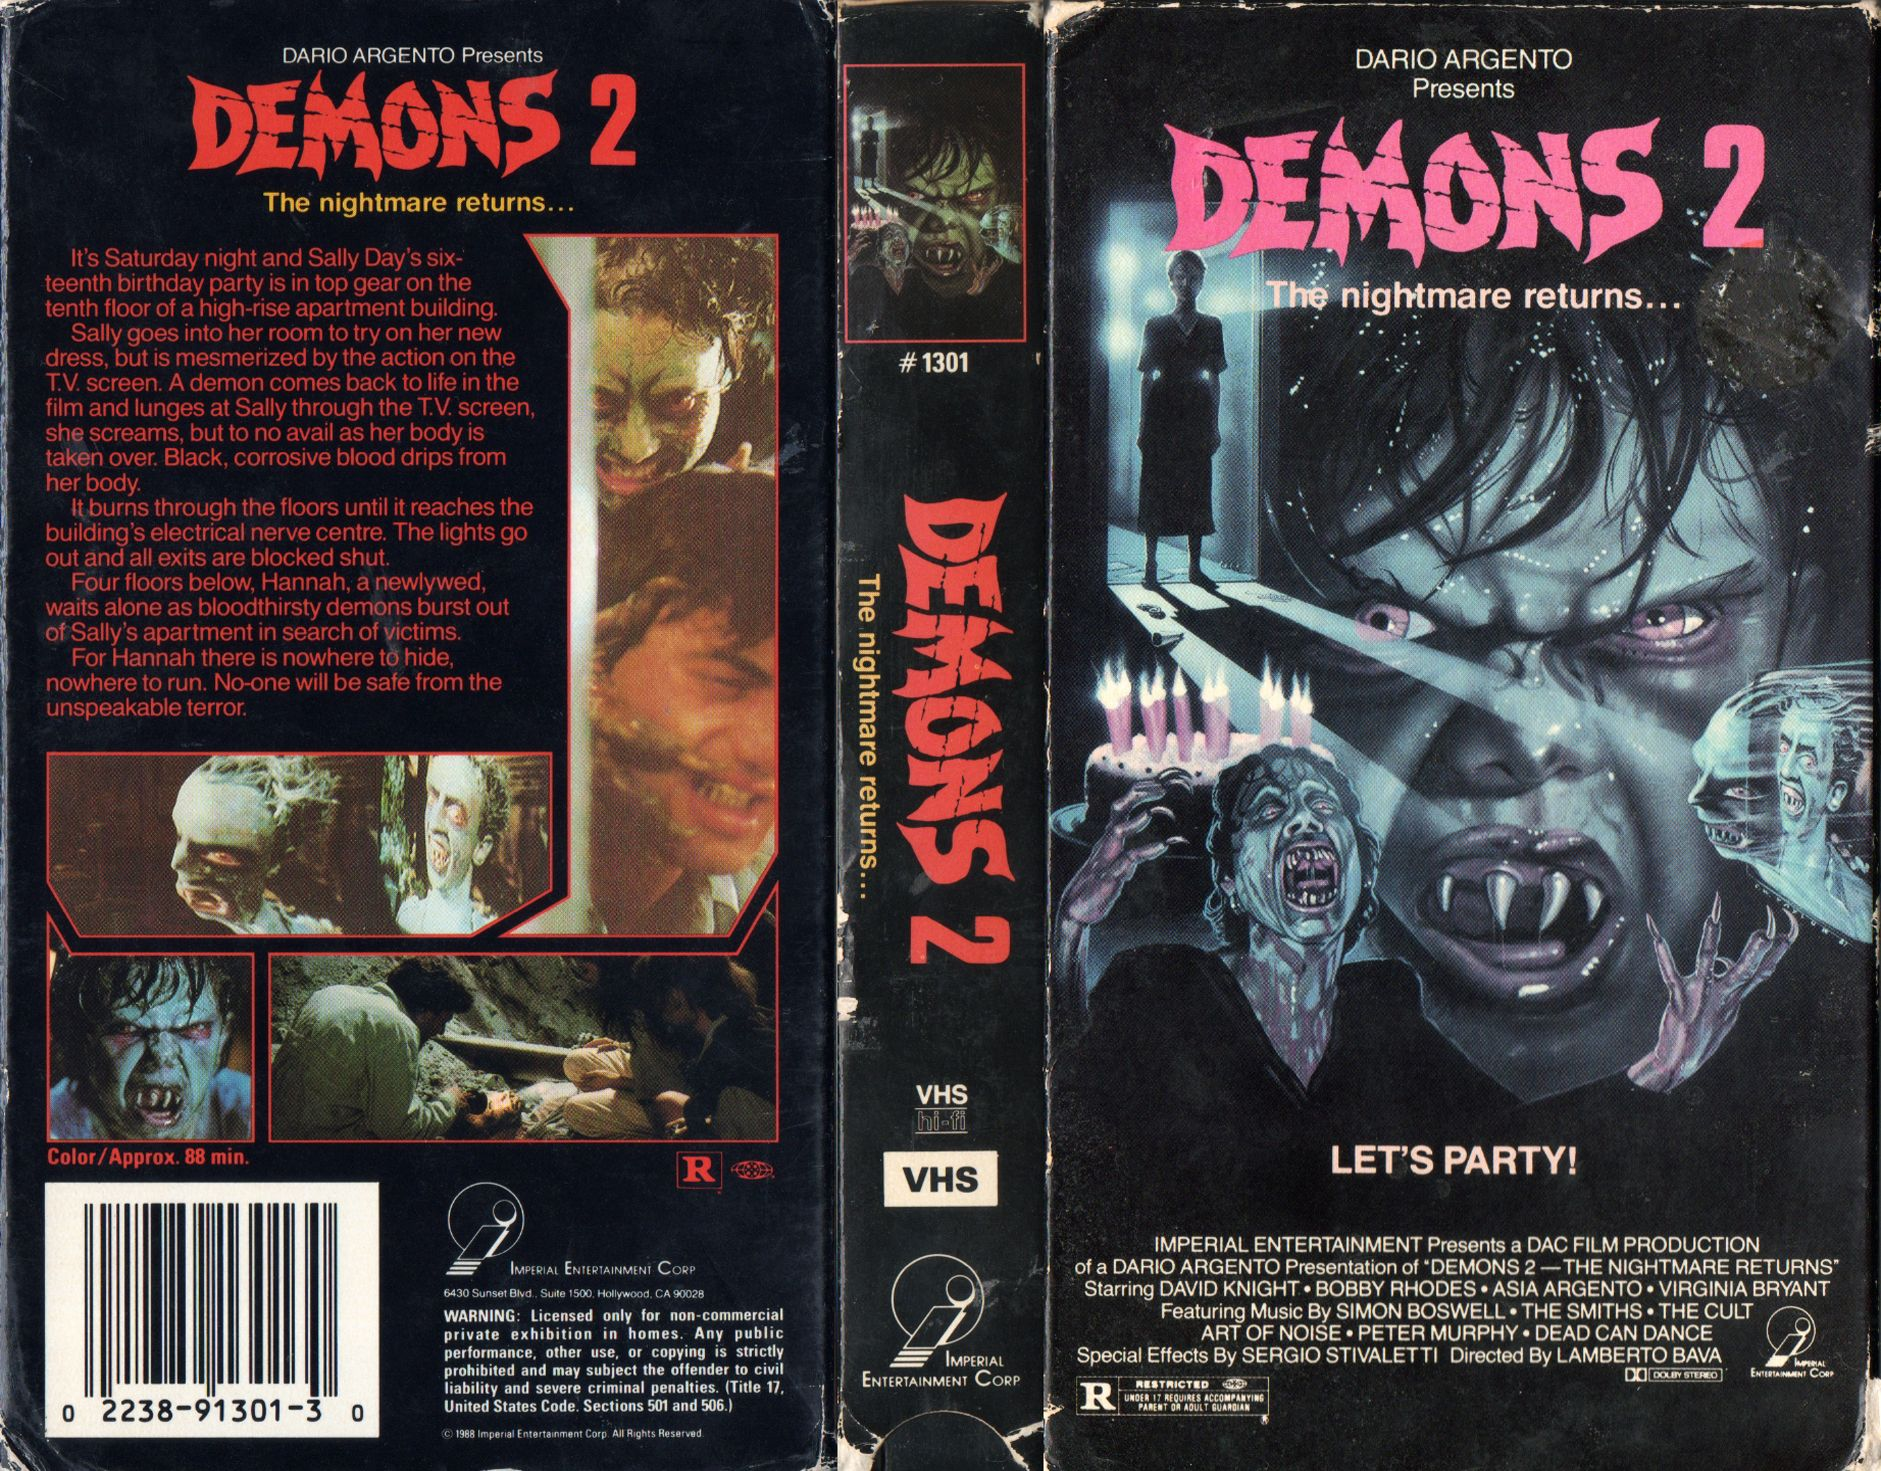 DEMONS-2.jpg (Imagen JPEG, 1881 × 1471 pixels) | MUNDO VHS ...